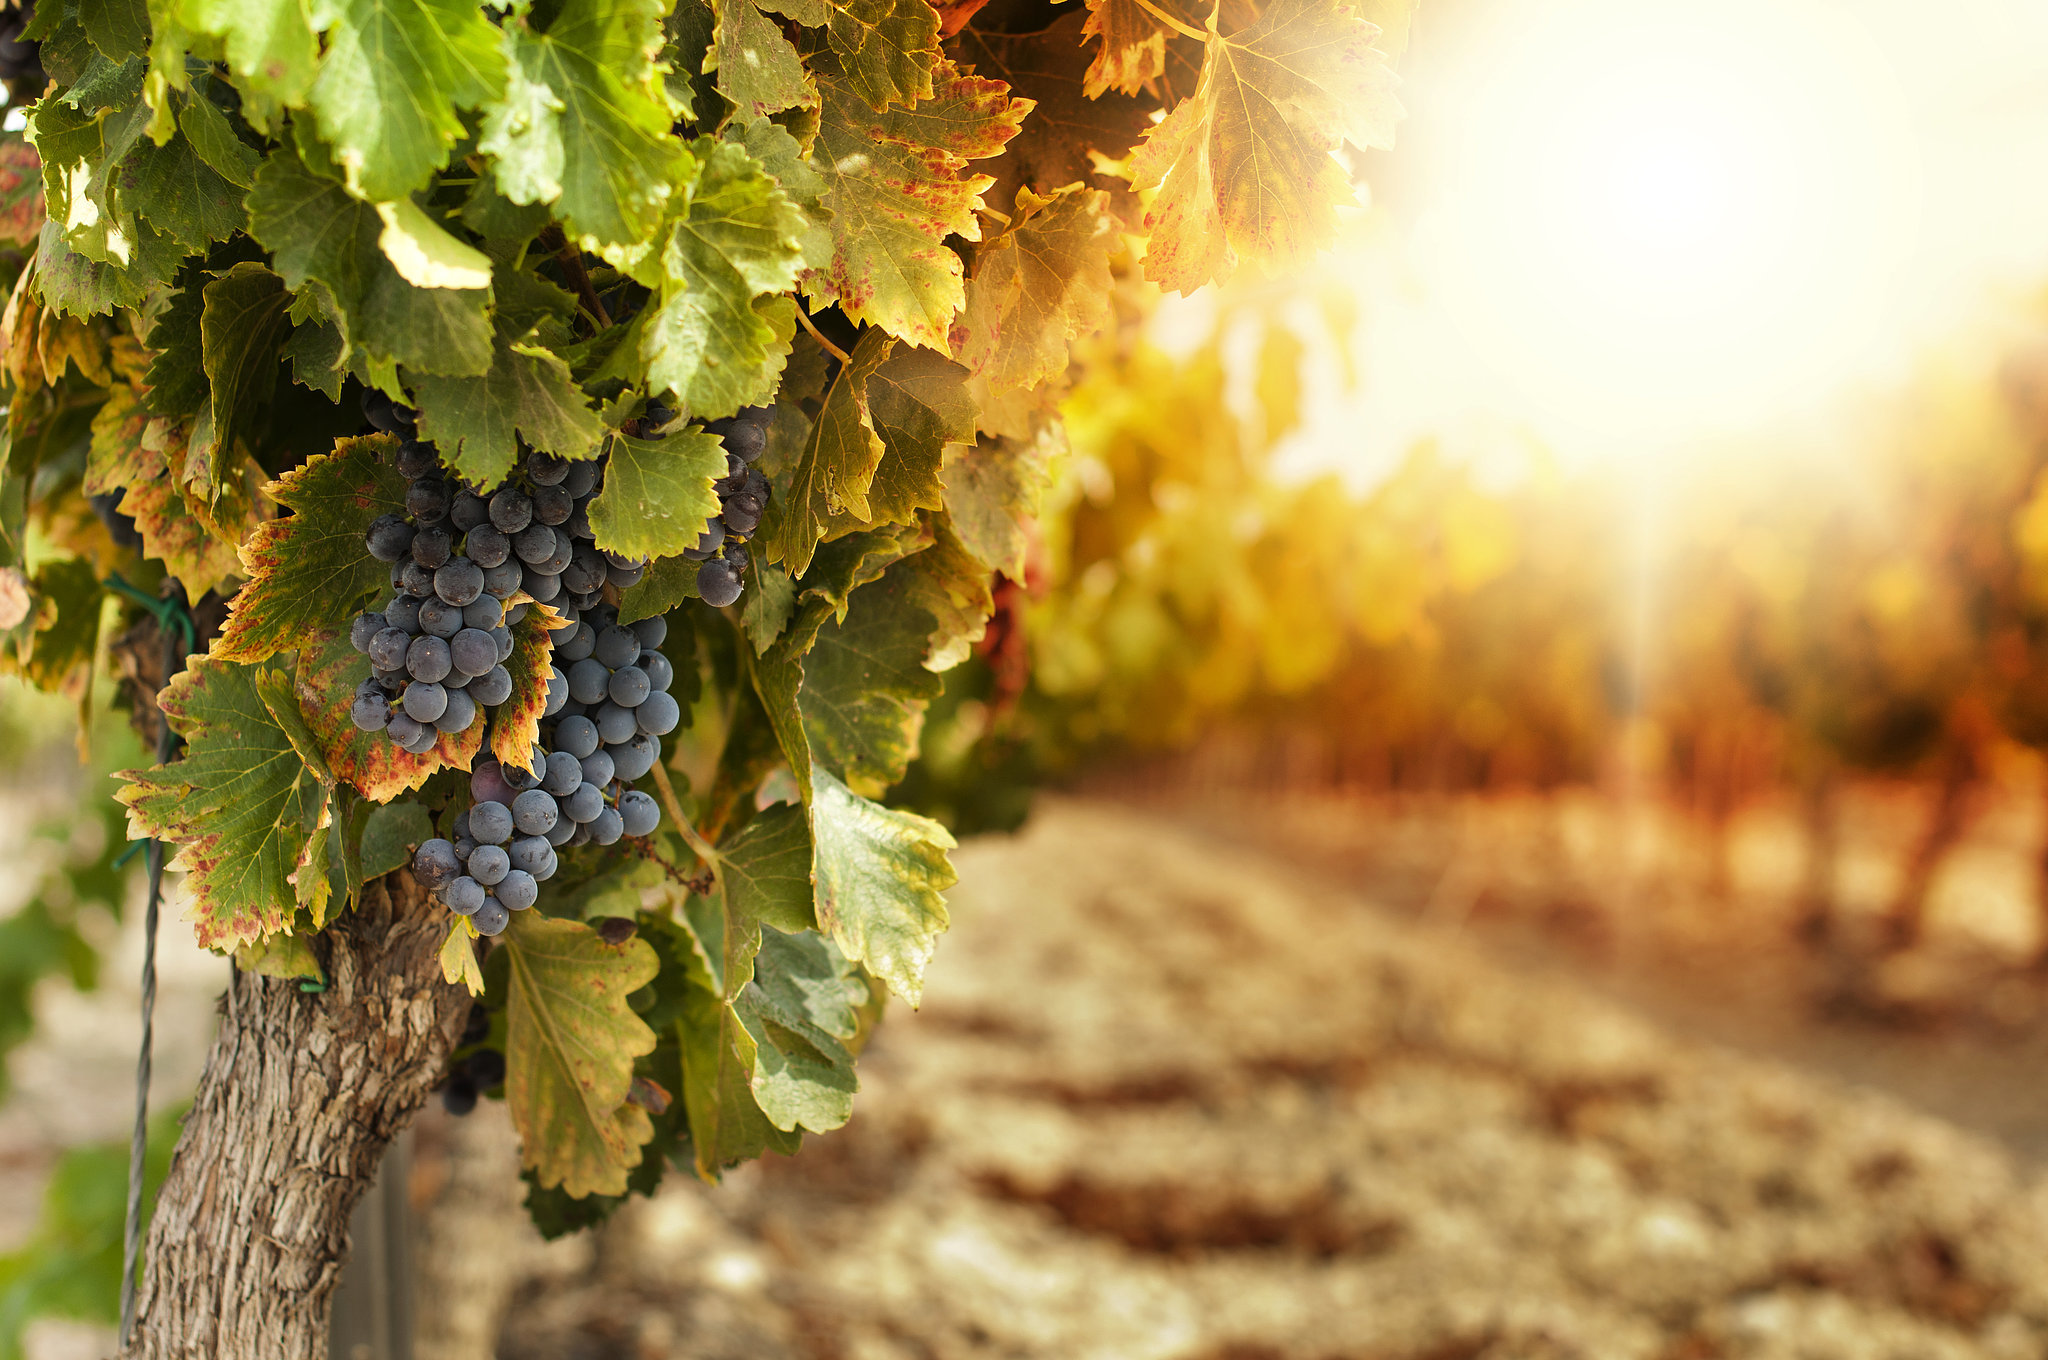 Wine-Loving-Bride-Winery-Tour.jpg